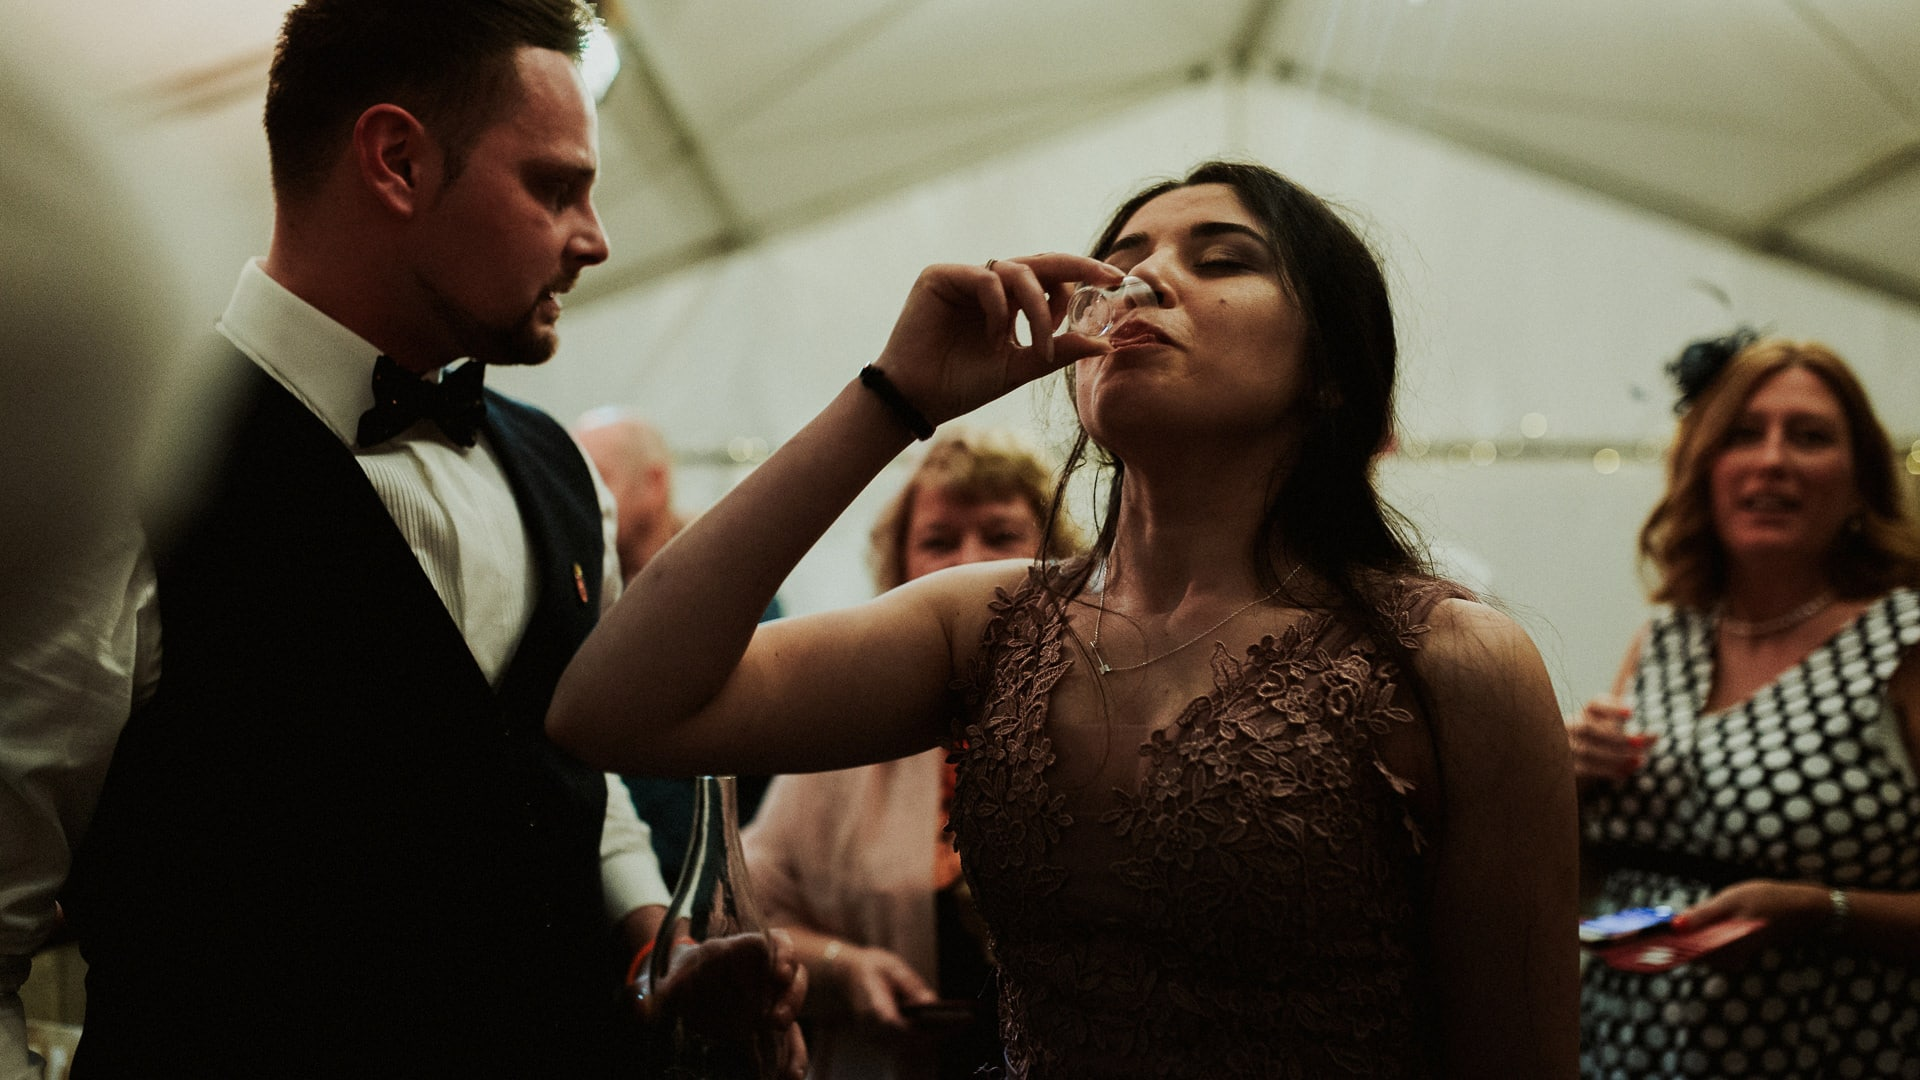 Edenbarn Wedding Photographer Lake District England 0021